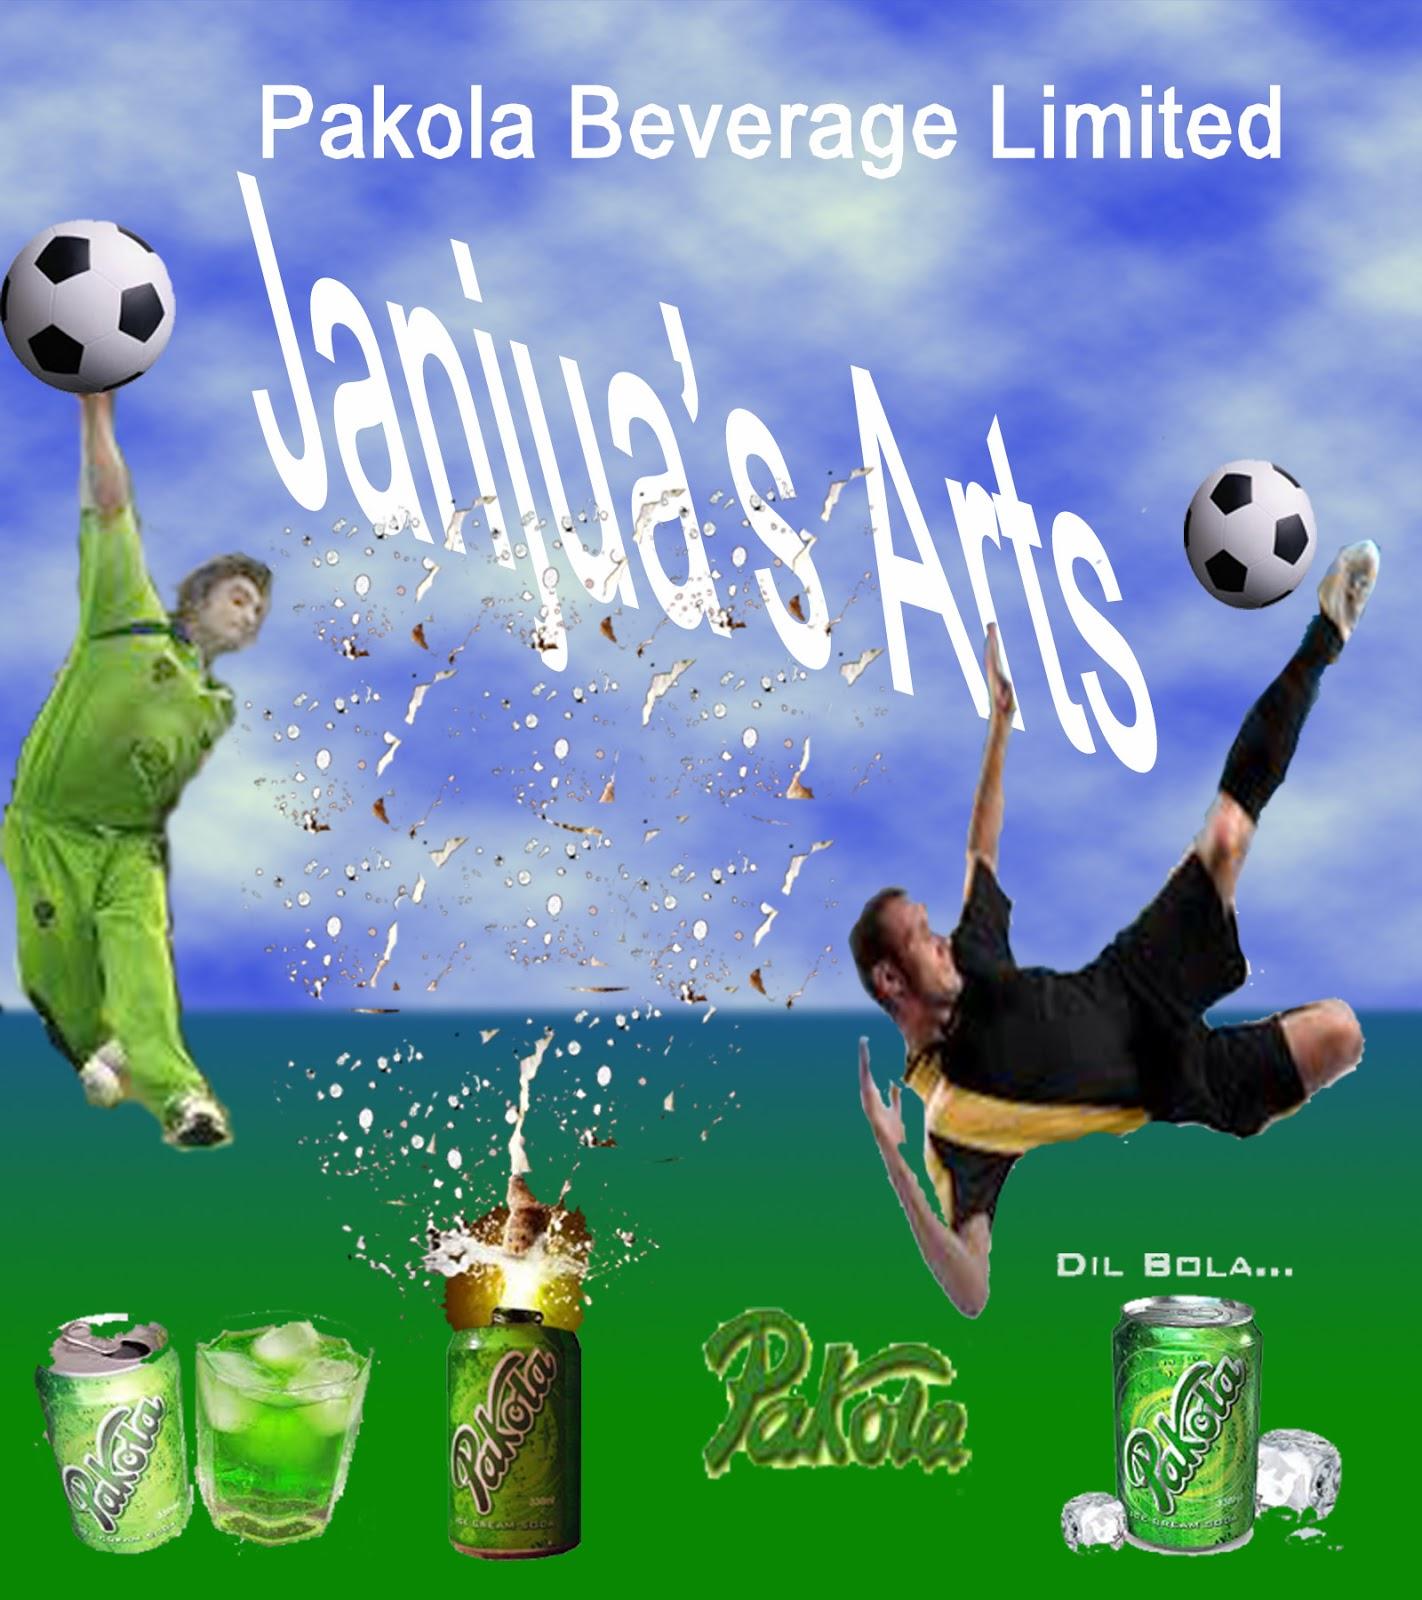 pakola report Re- launch of pakola advertising – final report bassir masood sayyed – 7541 imran hameed khan – 7834 hasan iqbal – 8254 tanya ghazali – 9188 s.